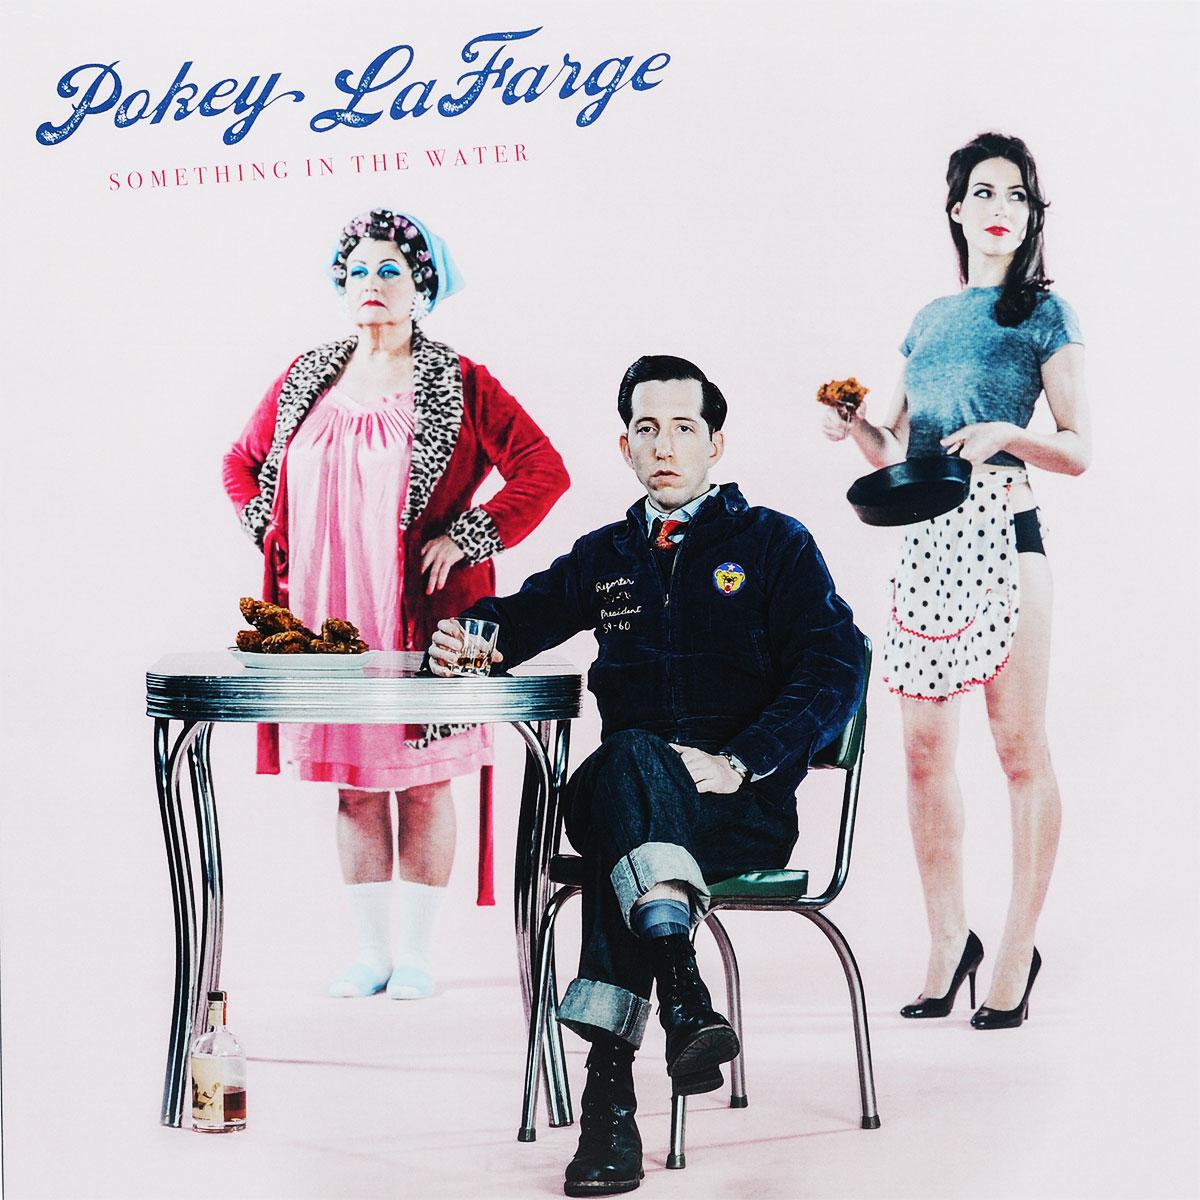 Поки Лафардж Pokey LaFarge. Something In The Water (LP)